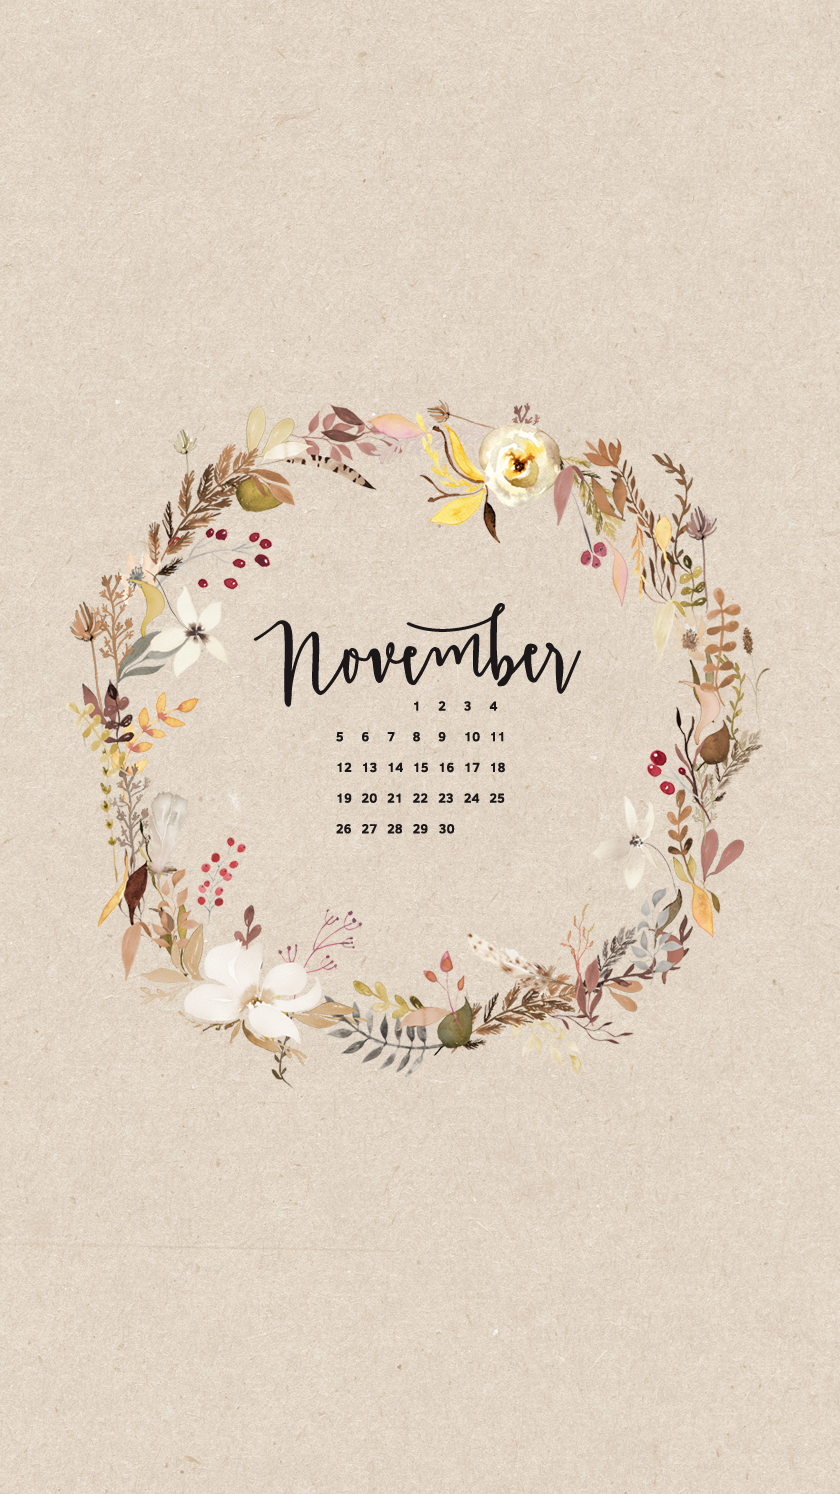 Hangtag November wallpaper, Iphone wallpaper november